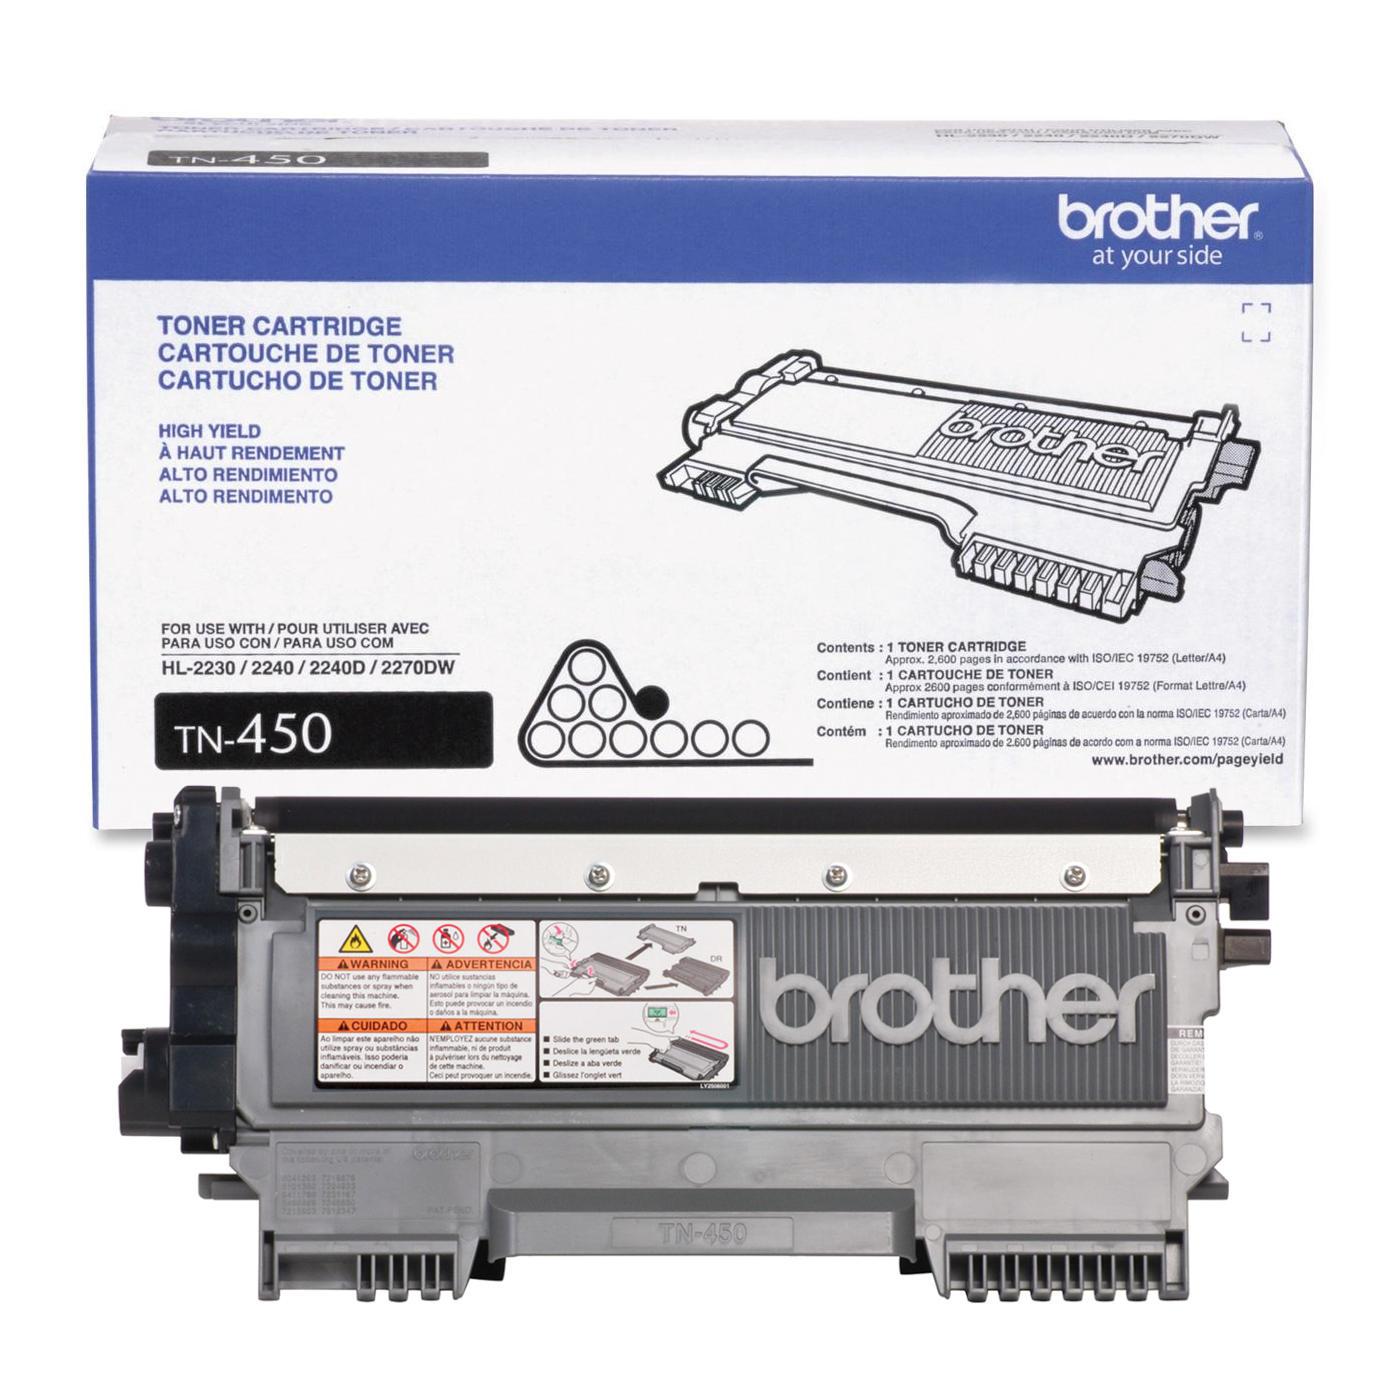 Brother TN450 Original Black Toner Cartridge High Yield